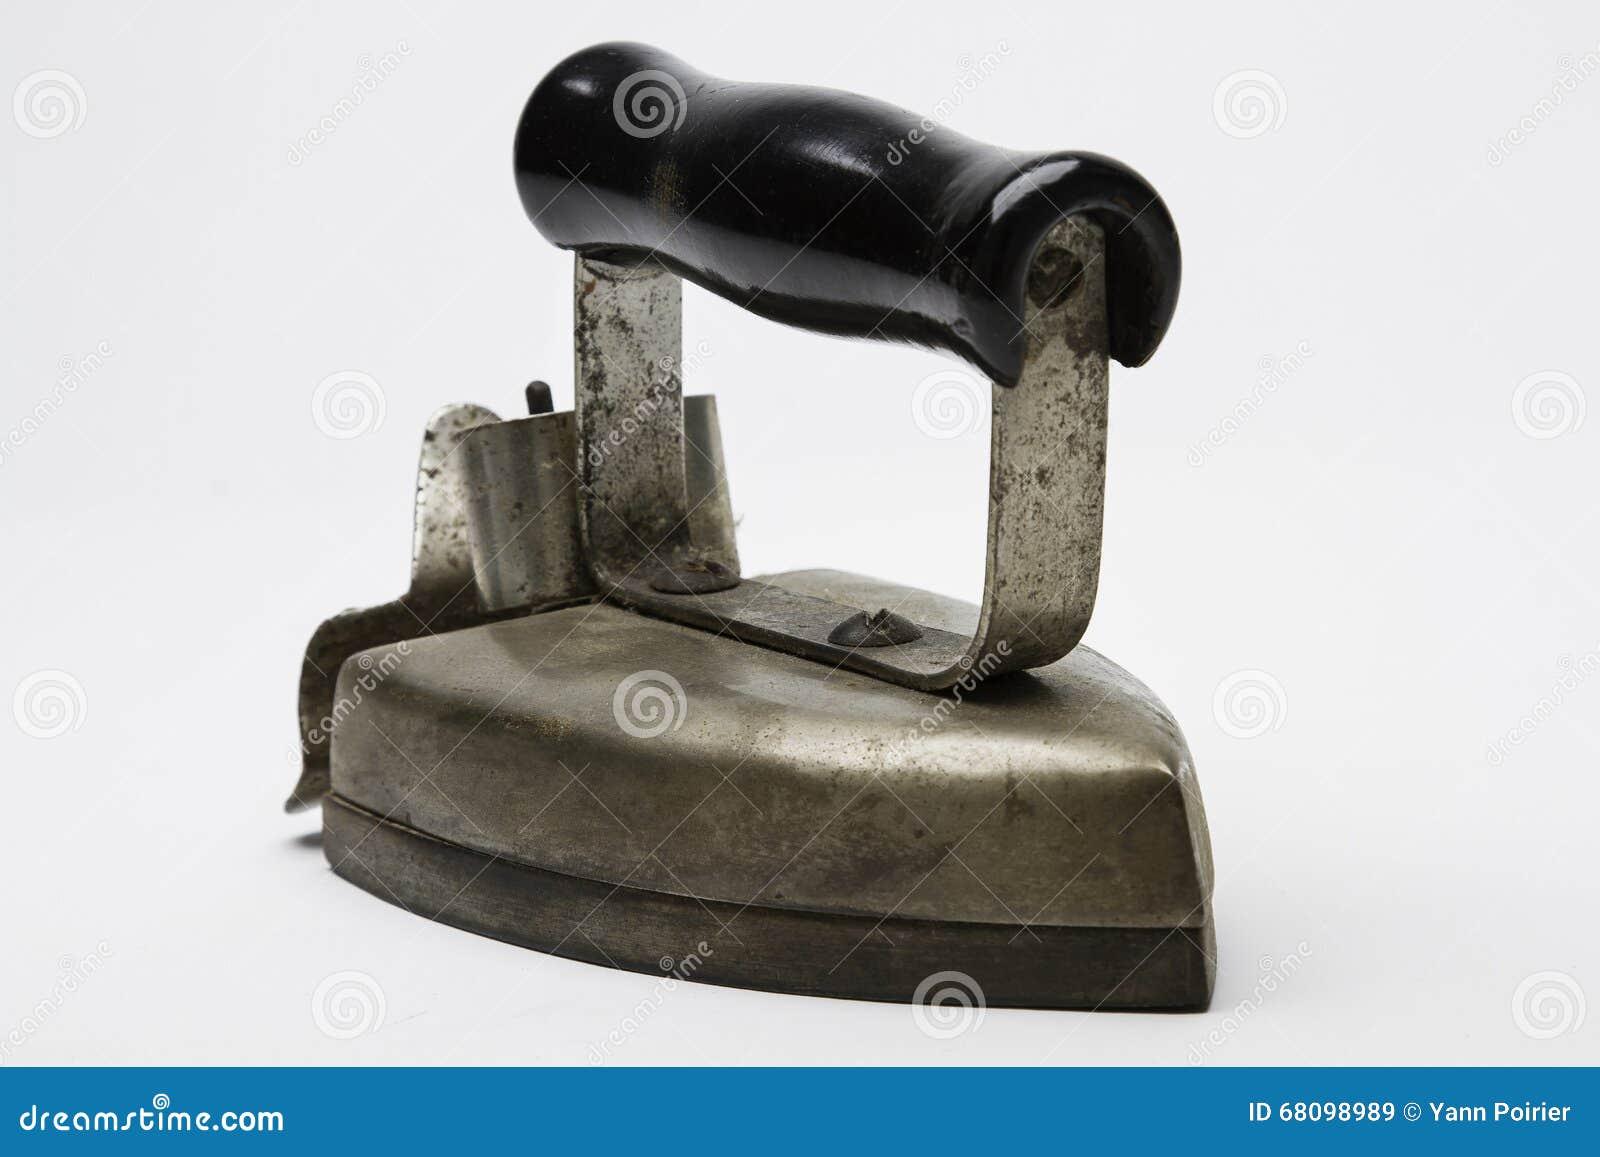 electric iron history